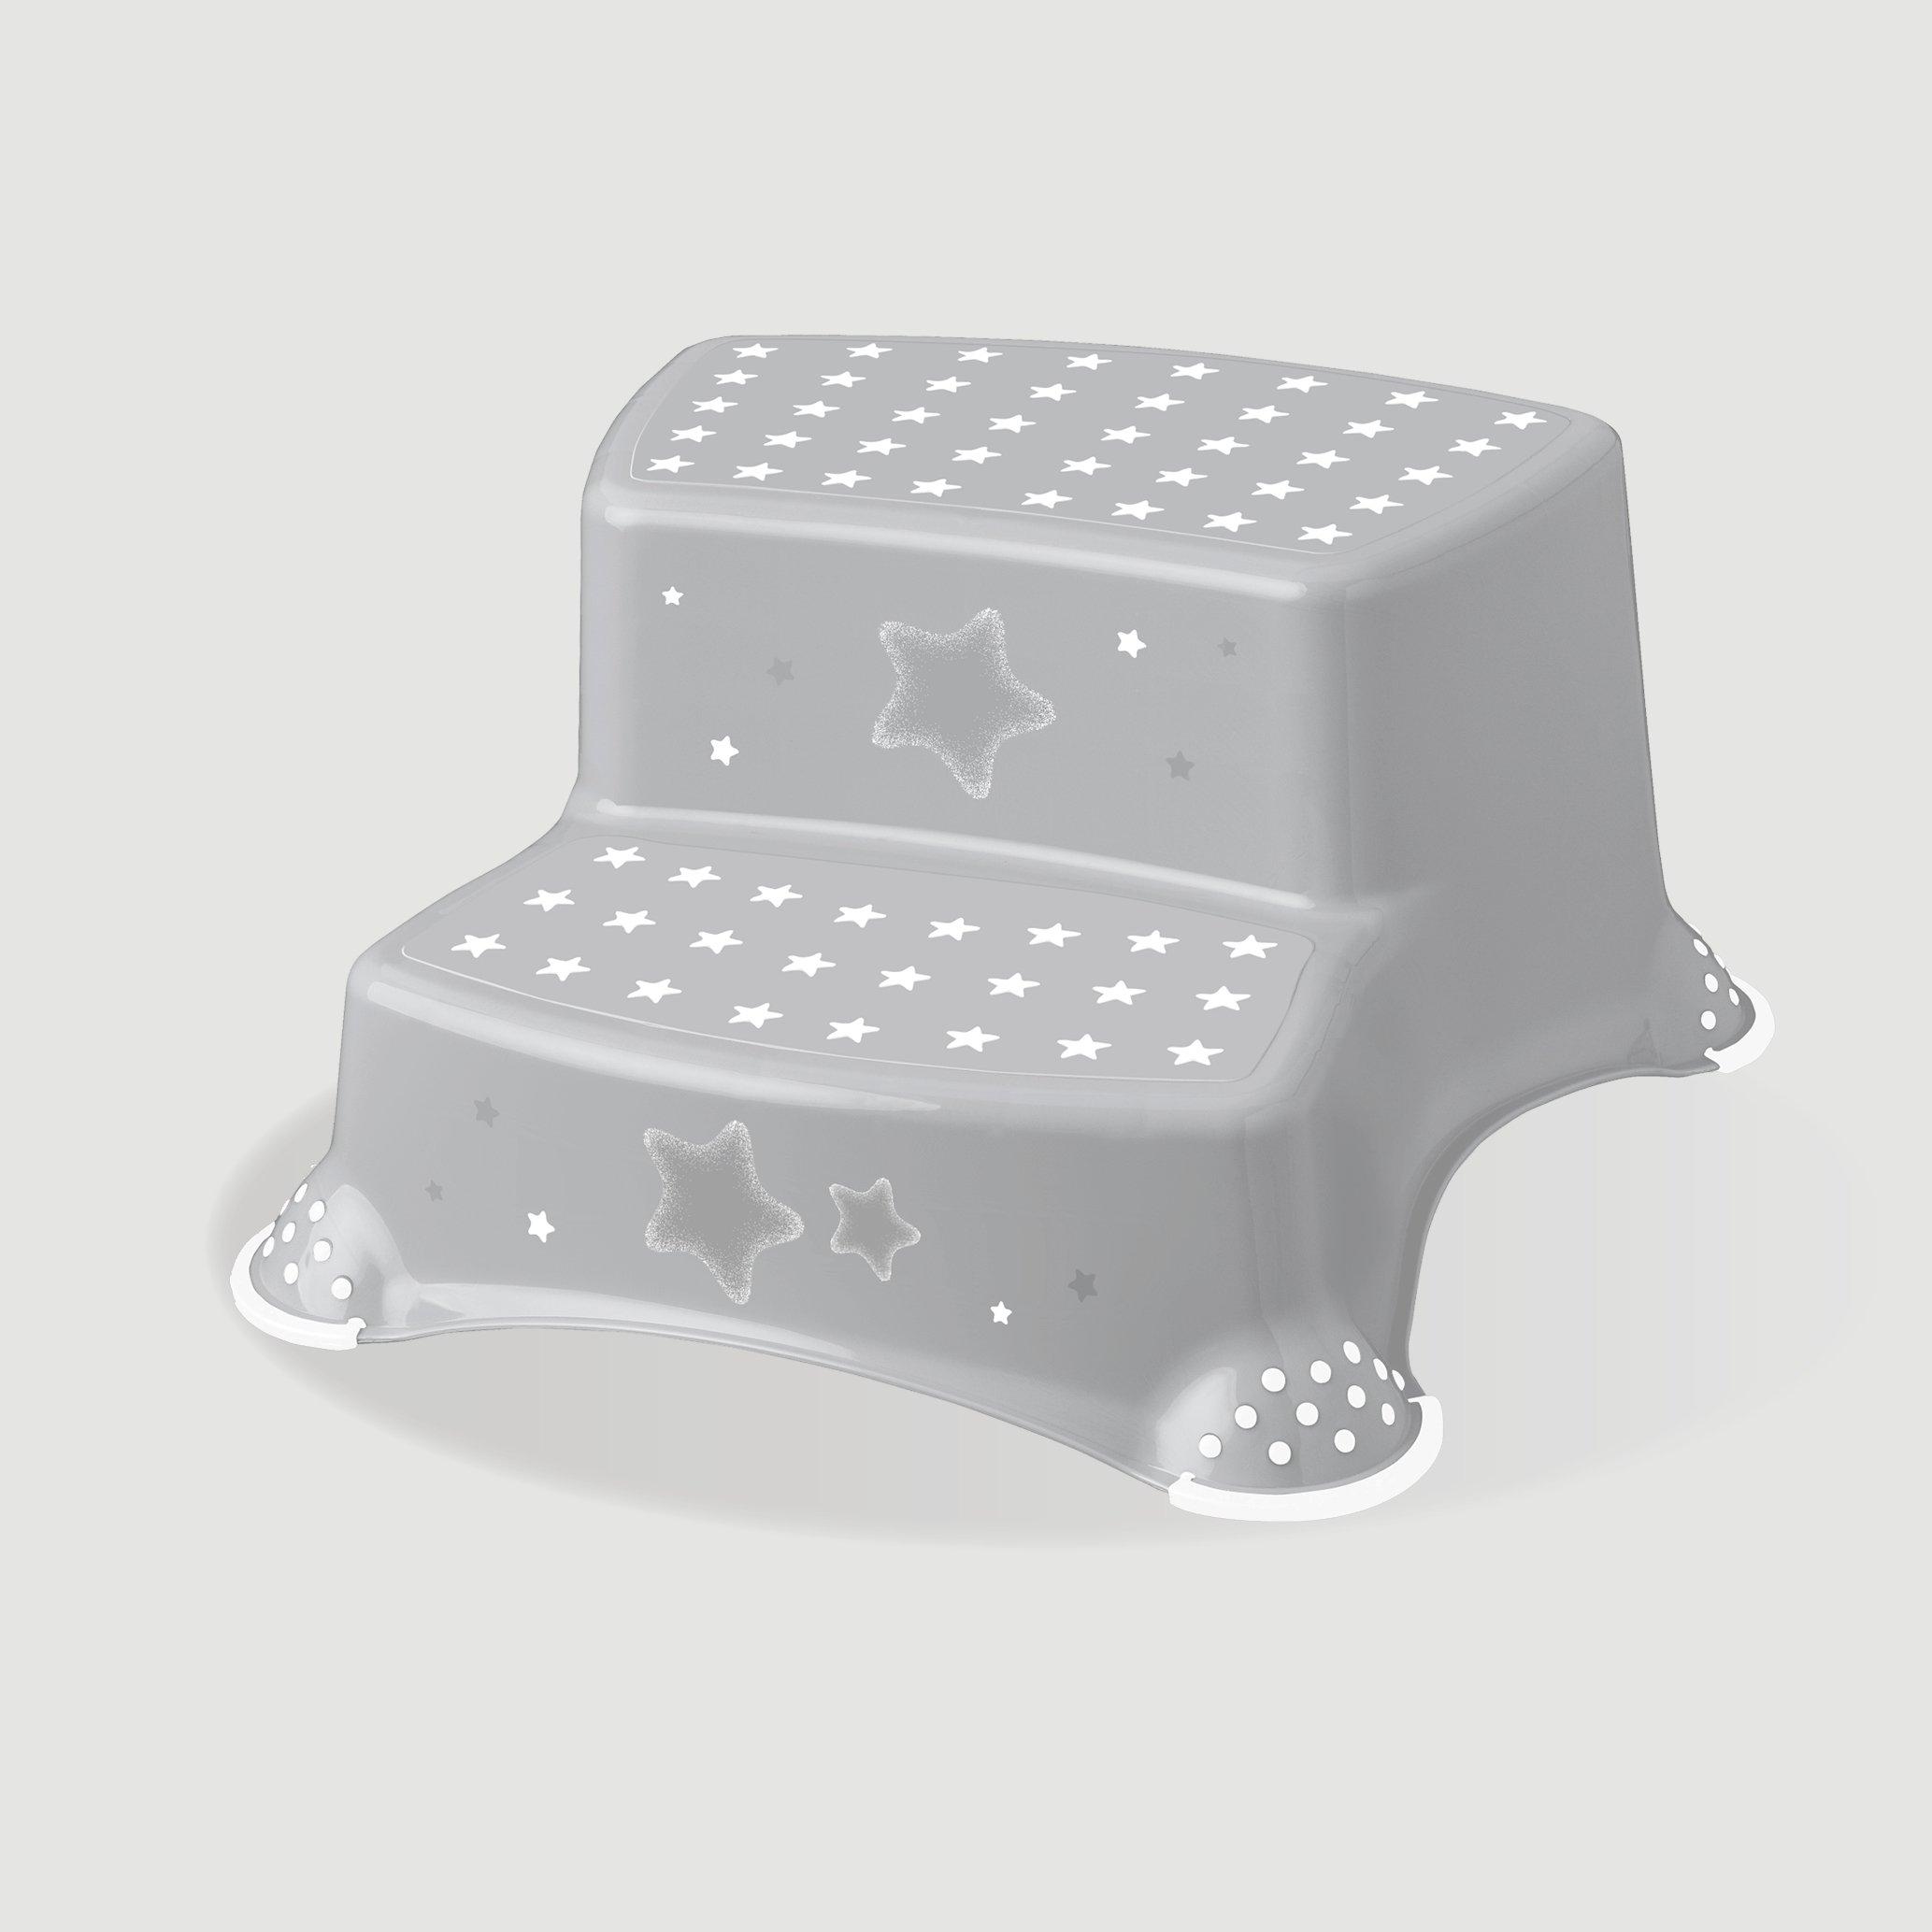 Proti�mykov� stupienok stoli�ka dvojstup�ov� stars �ed�